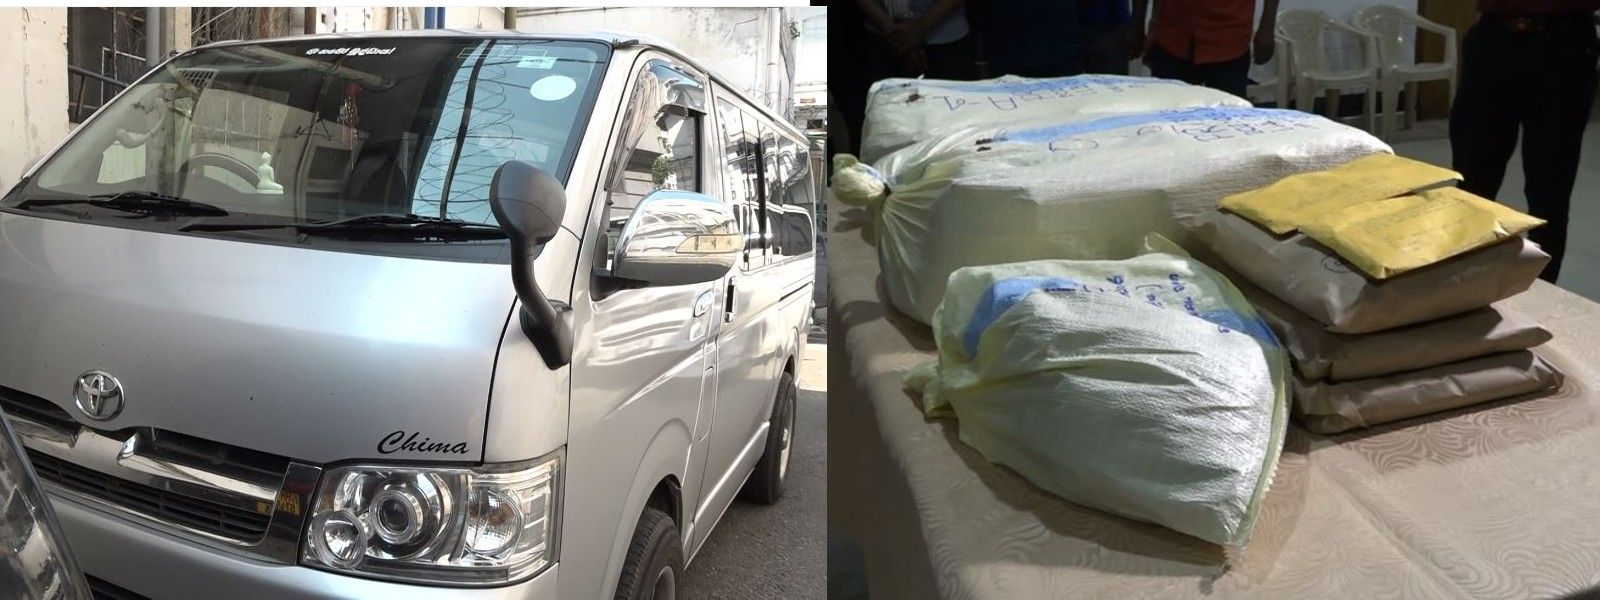 Horana heroin part of 'Harak Kata's drug operation; Police